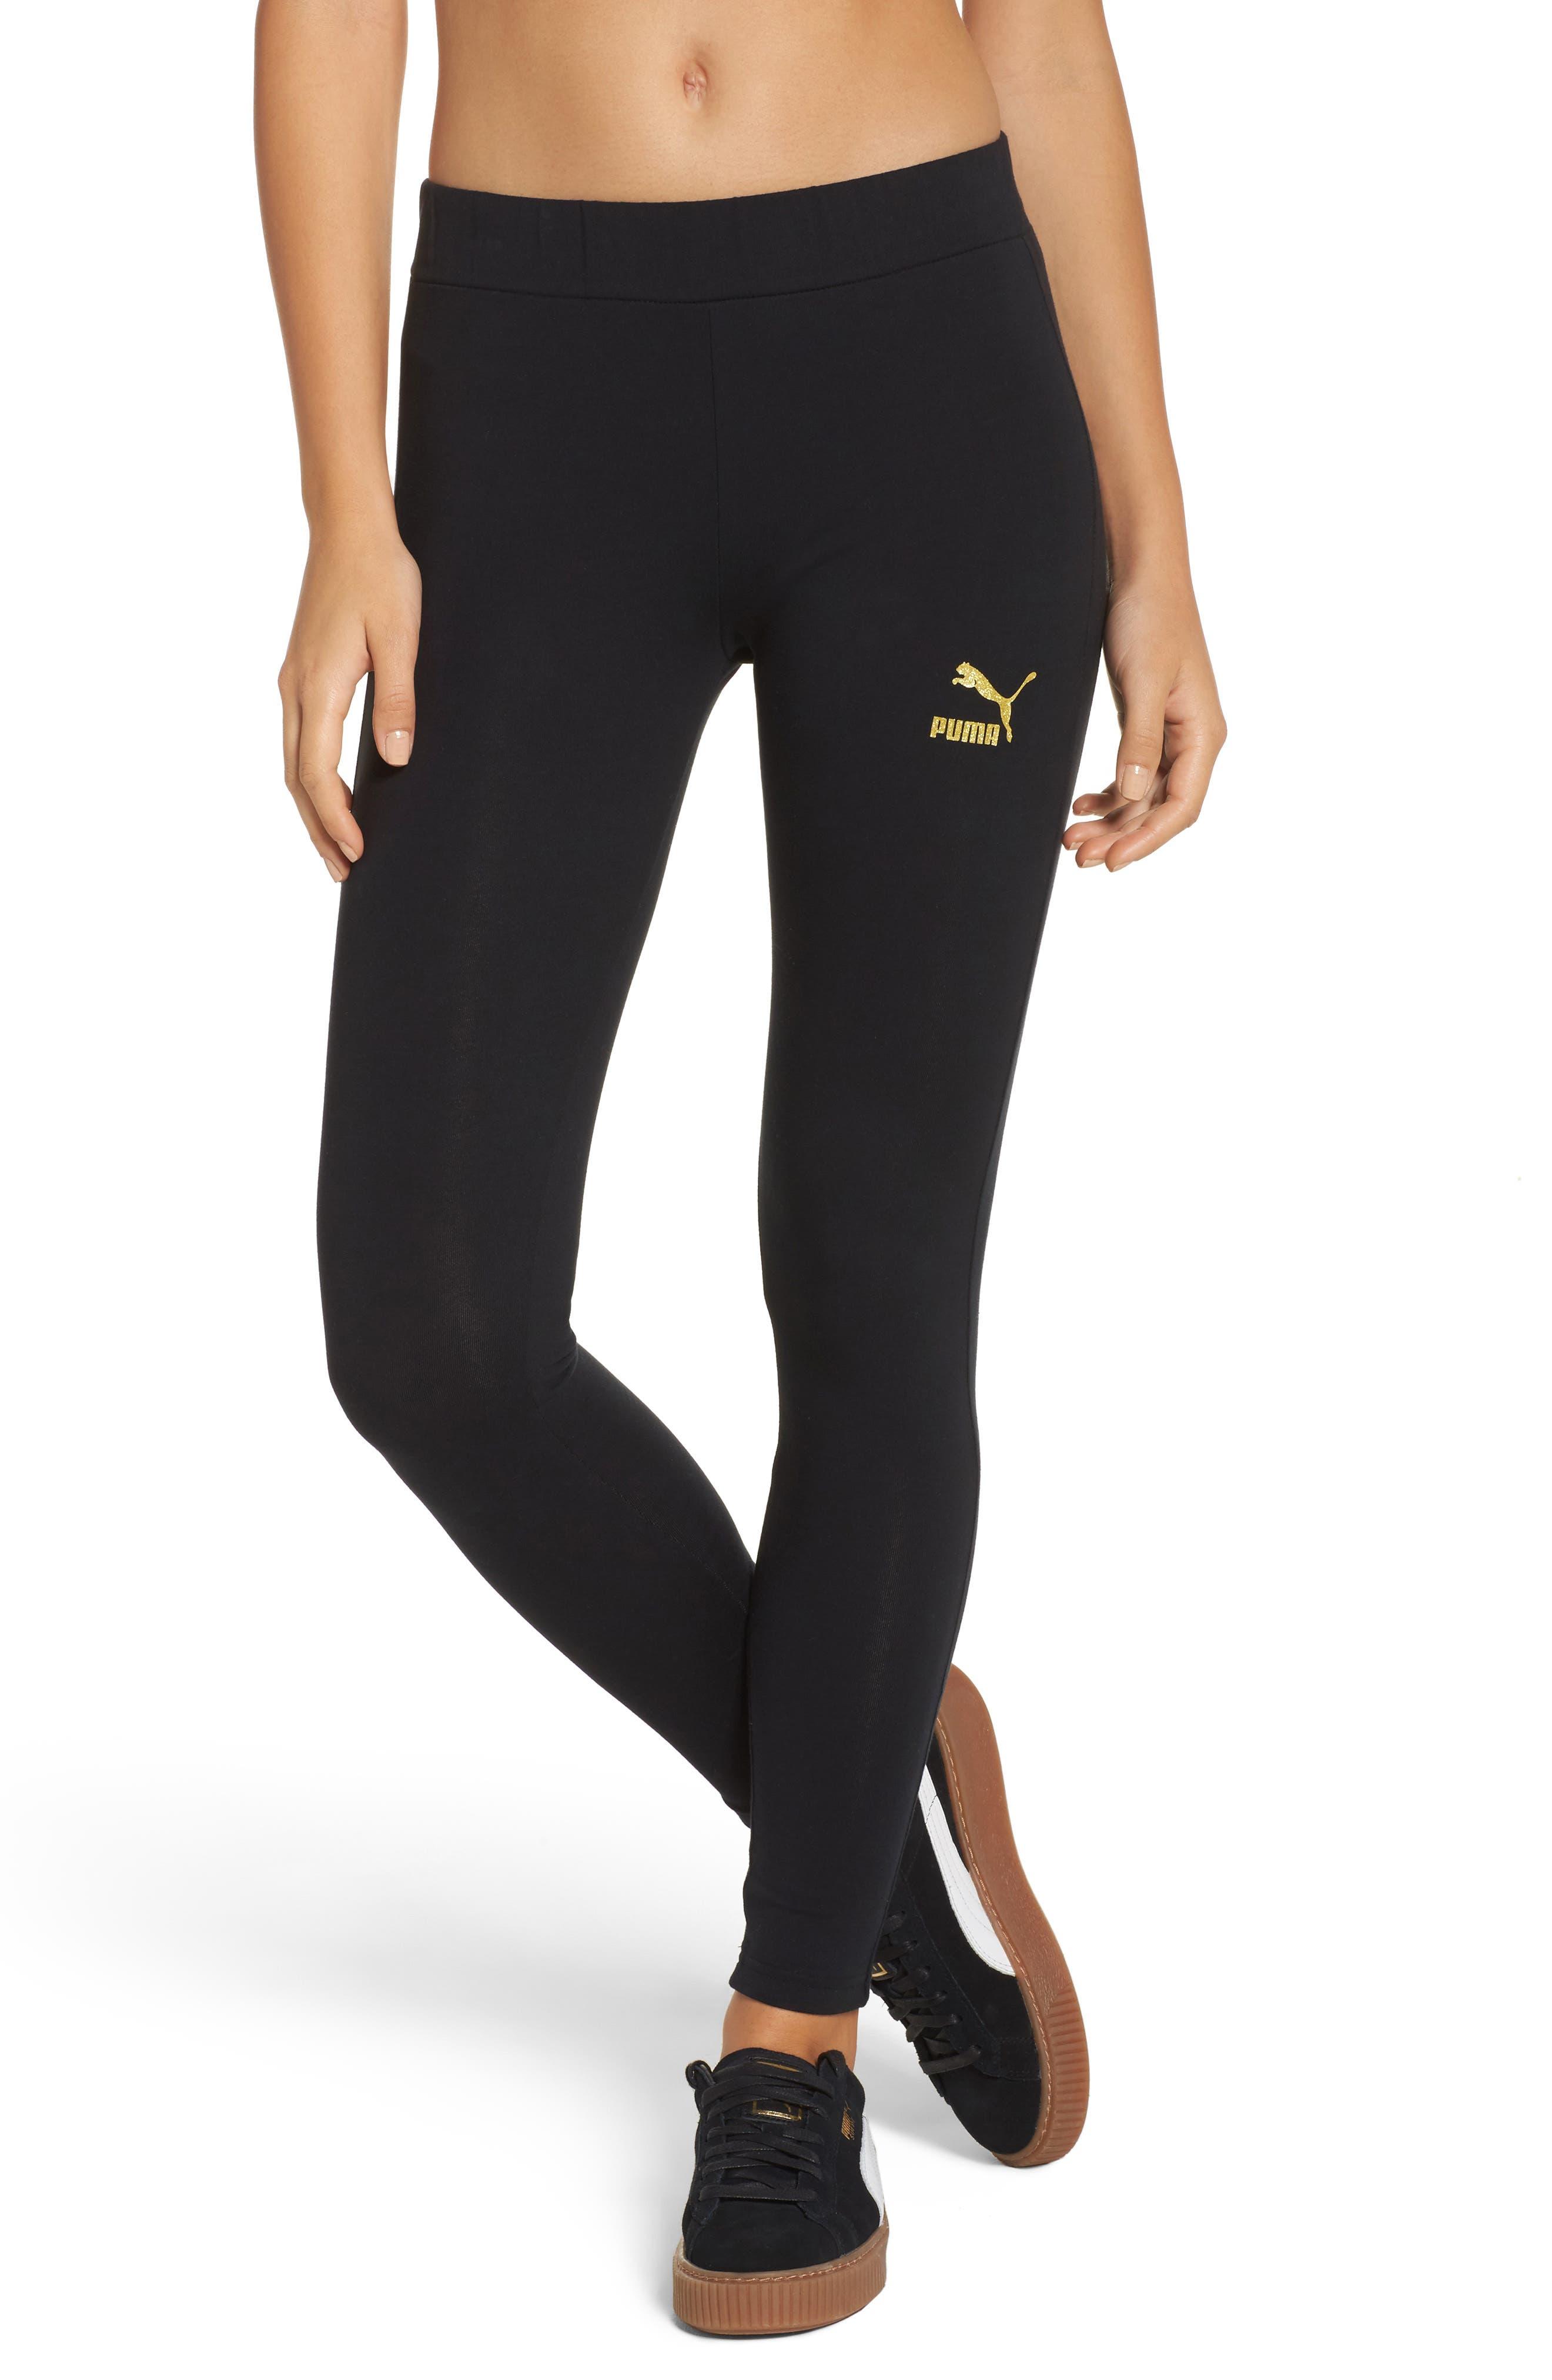 Glam Leggings,                         Main,                         color, Puma Black-Gold Glitter